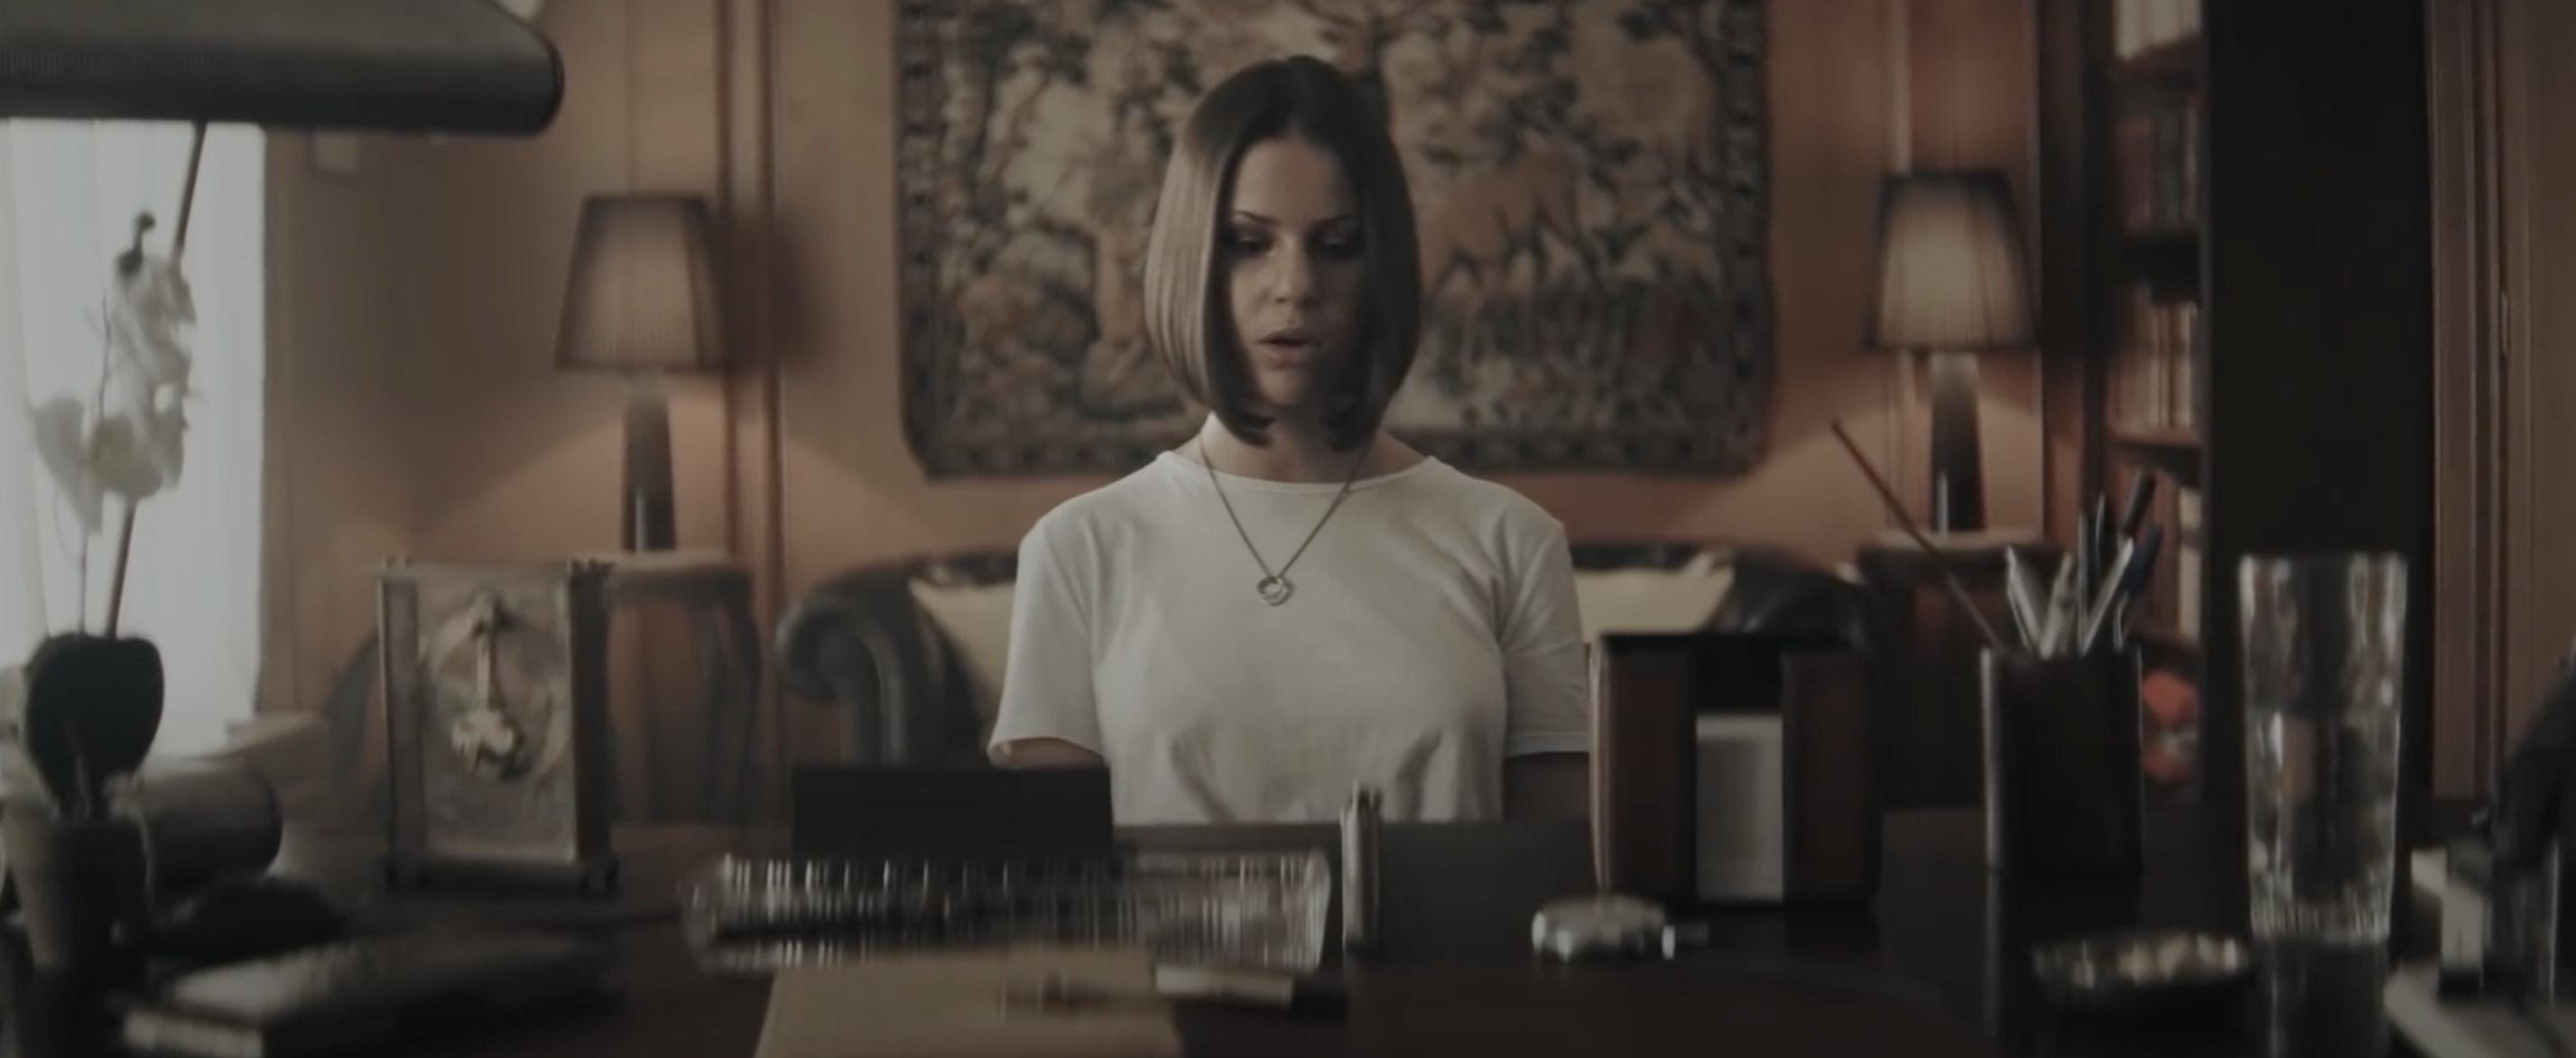 Marina Kaye - Twisted